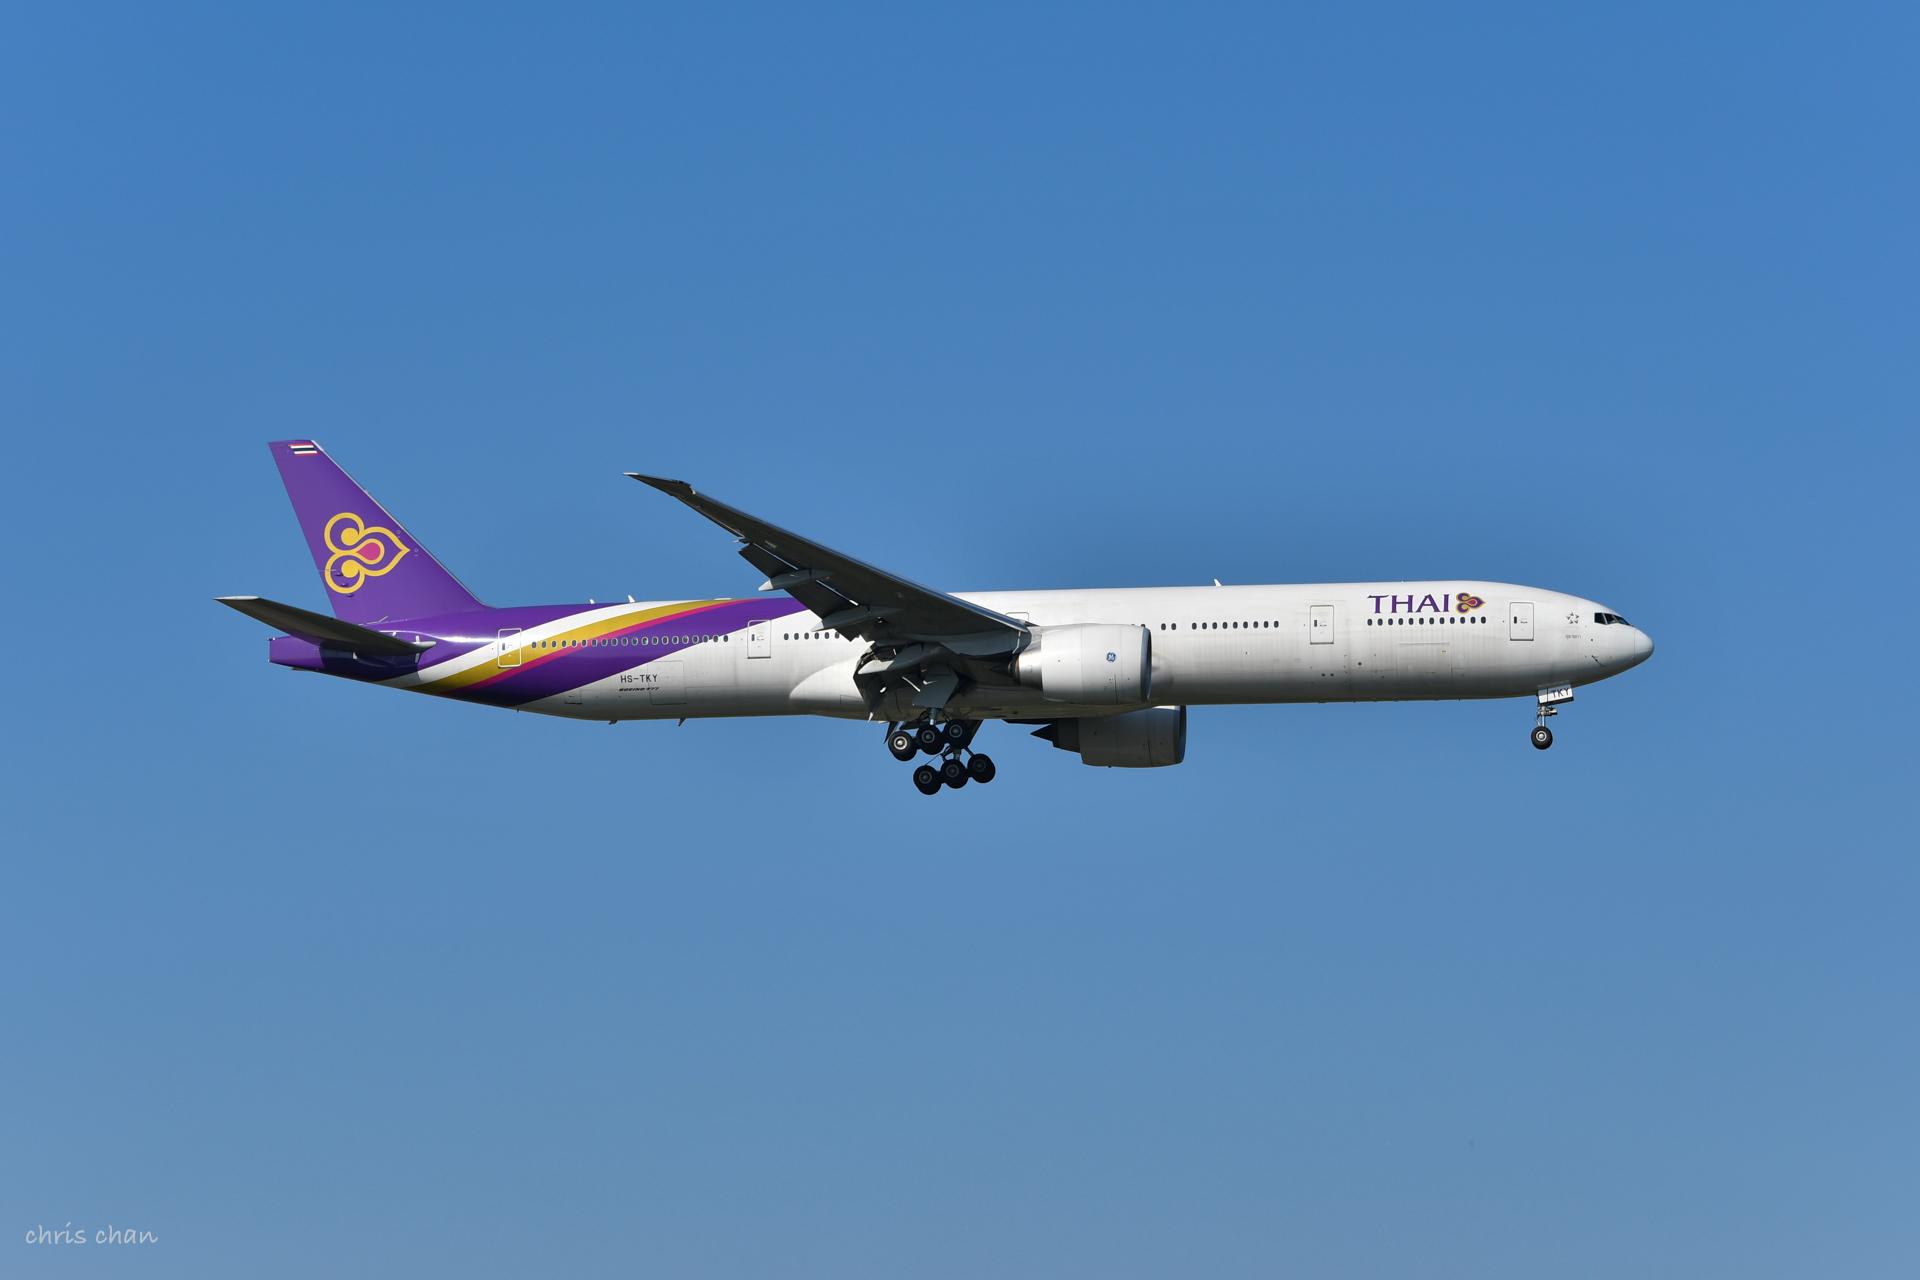 Re:[原创]新人报道——PVG首拍 BOEING 777-300ER HS-TKY 中国上海浦东国际机场